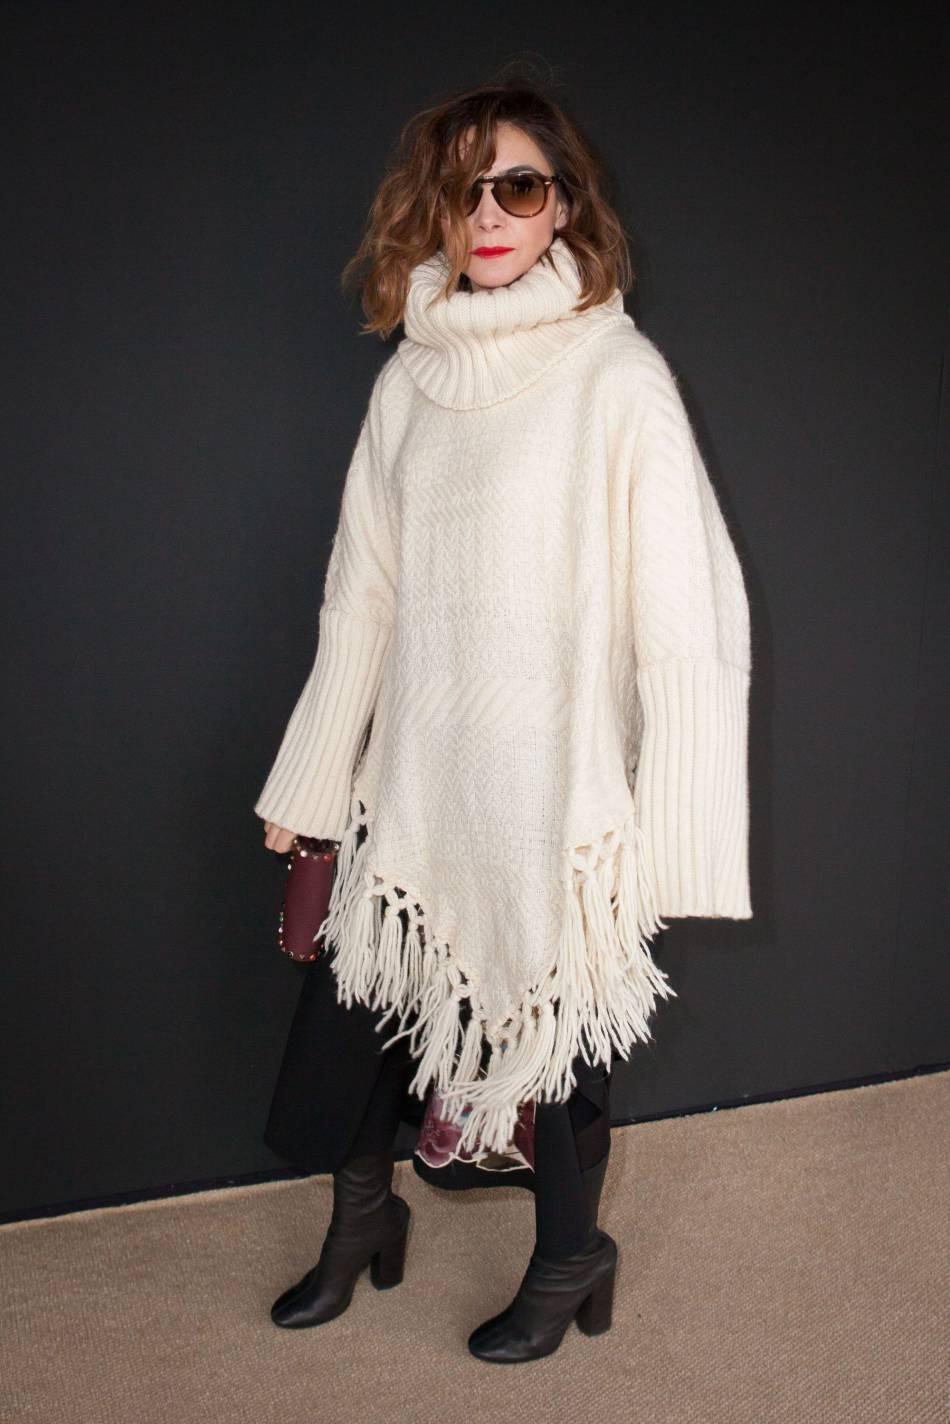 Clotilde Courau et son joli look hivernal, mardi 8 mars au show Valentino.